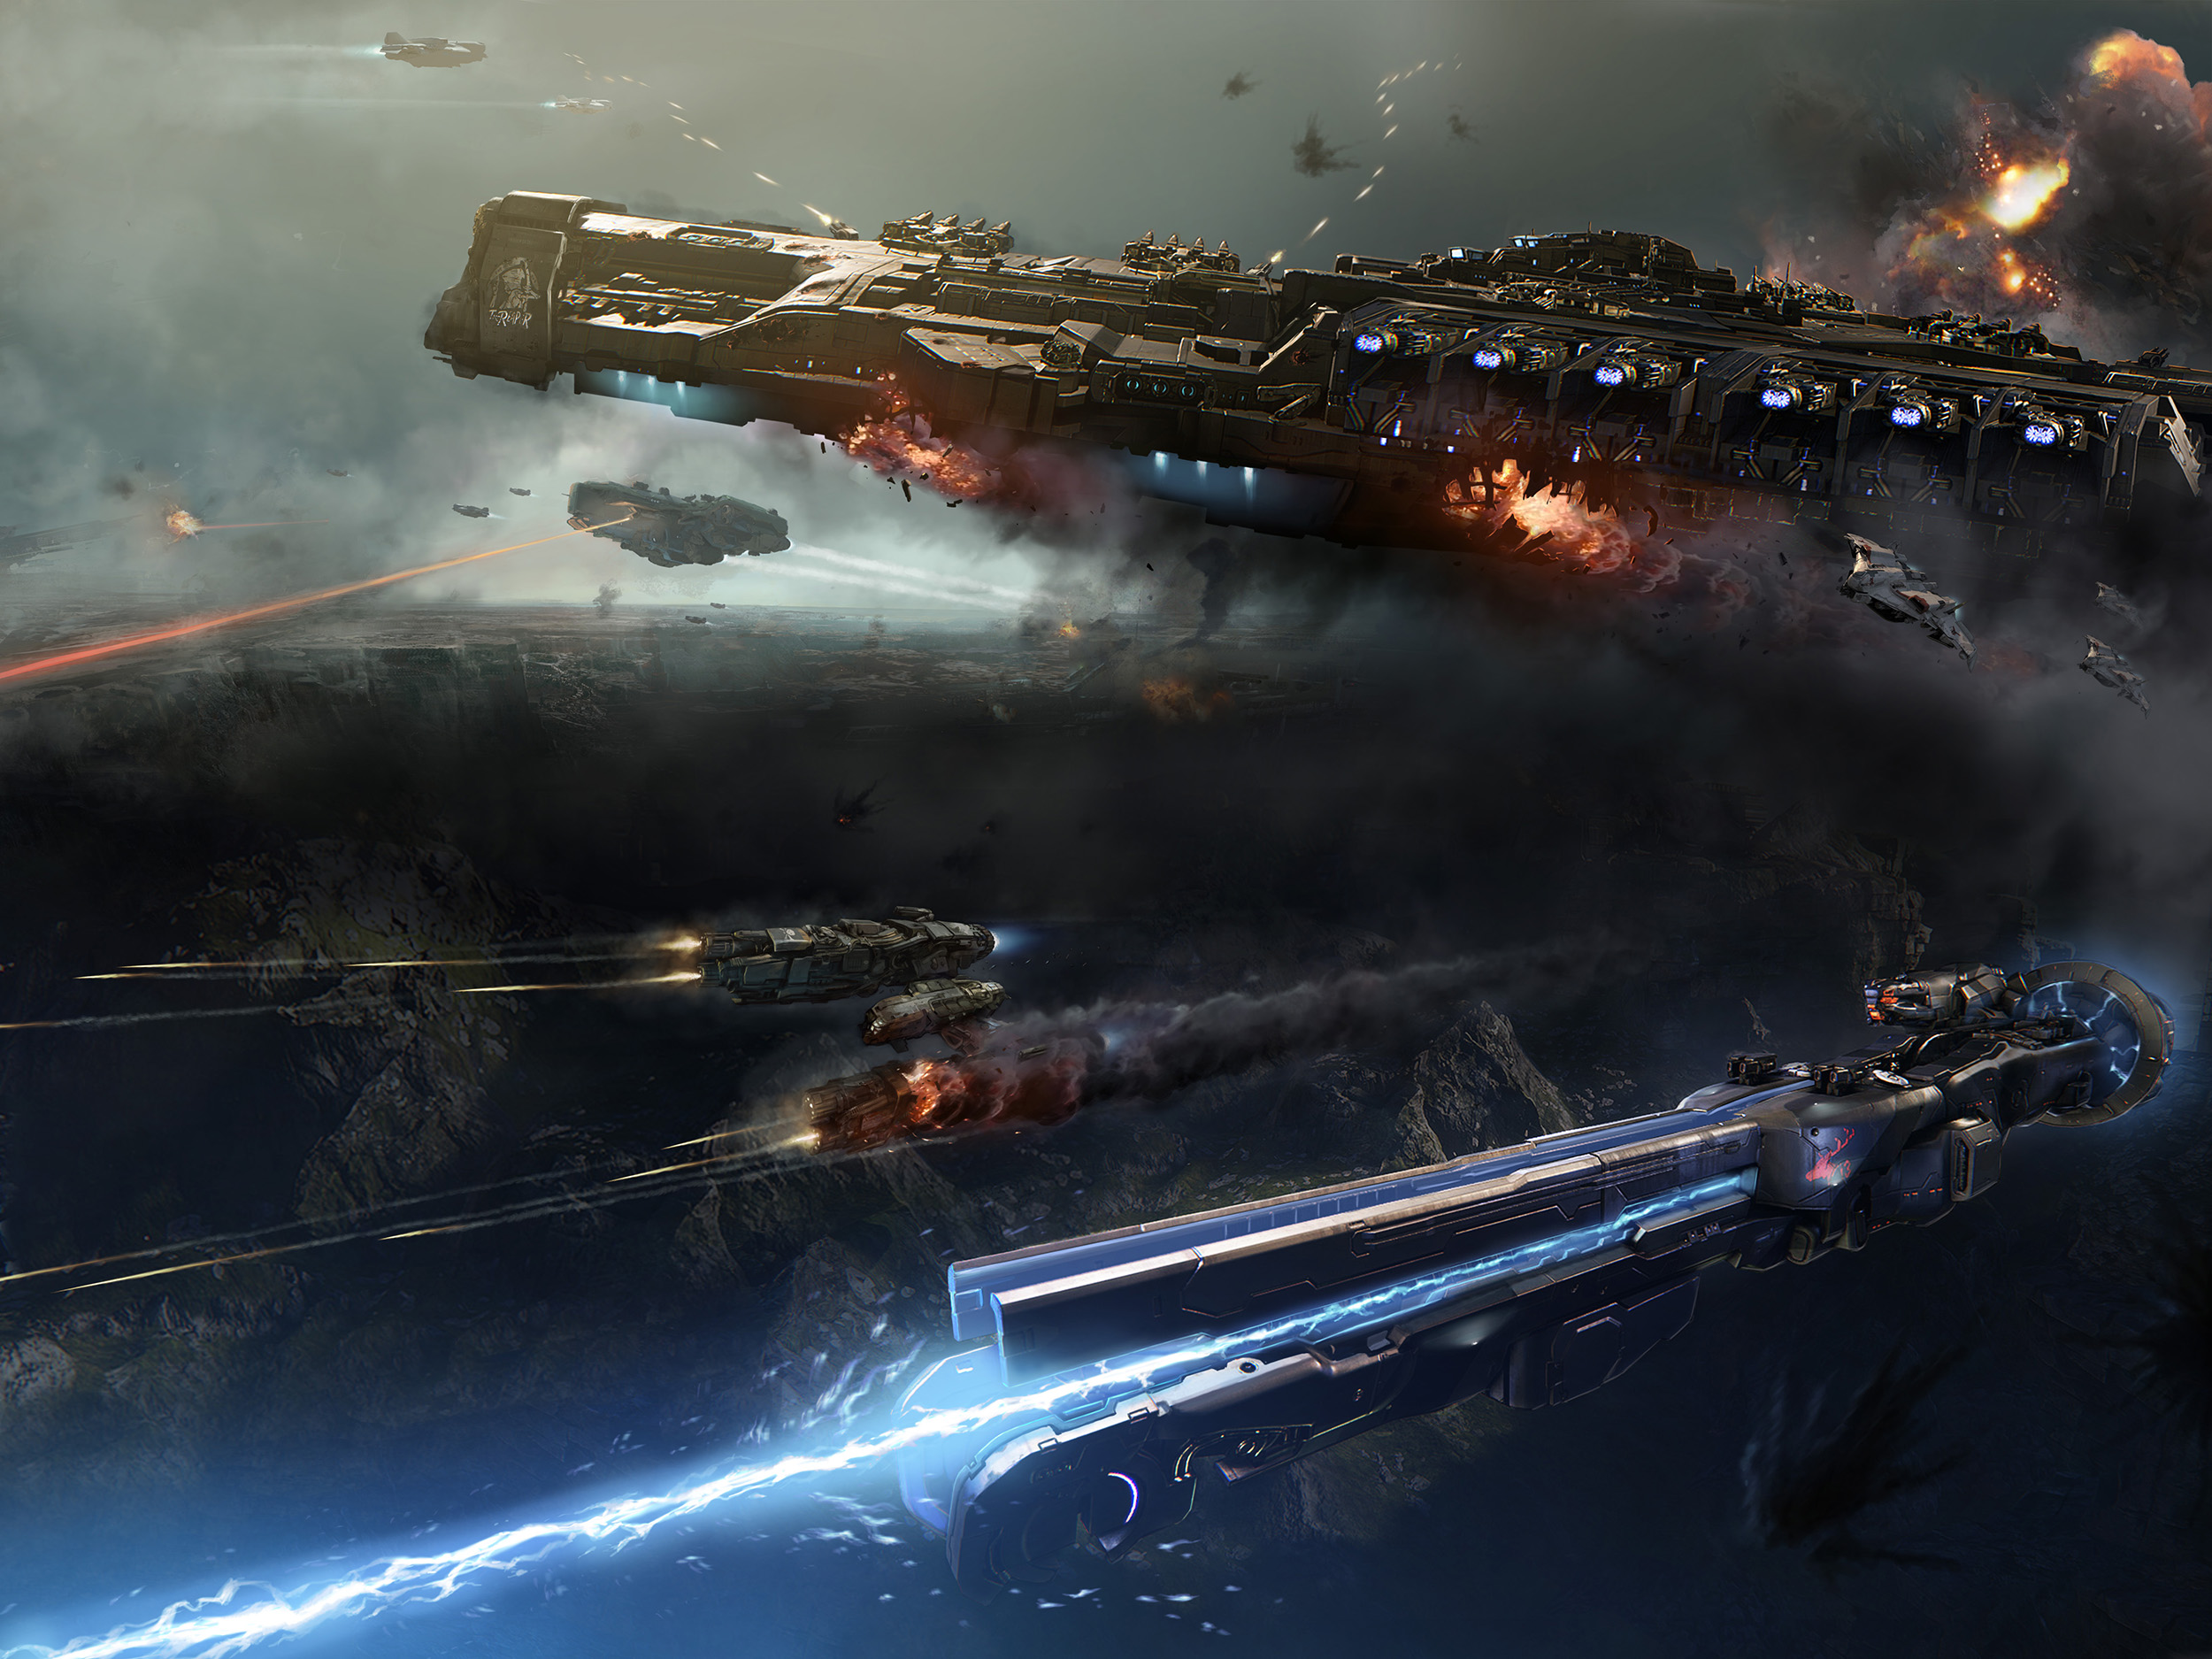 戦う宇宙船画像